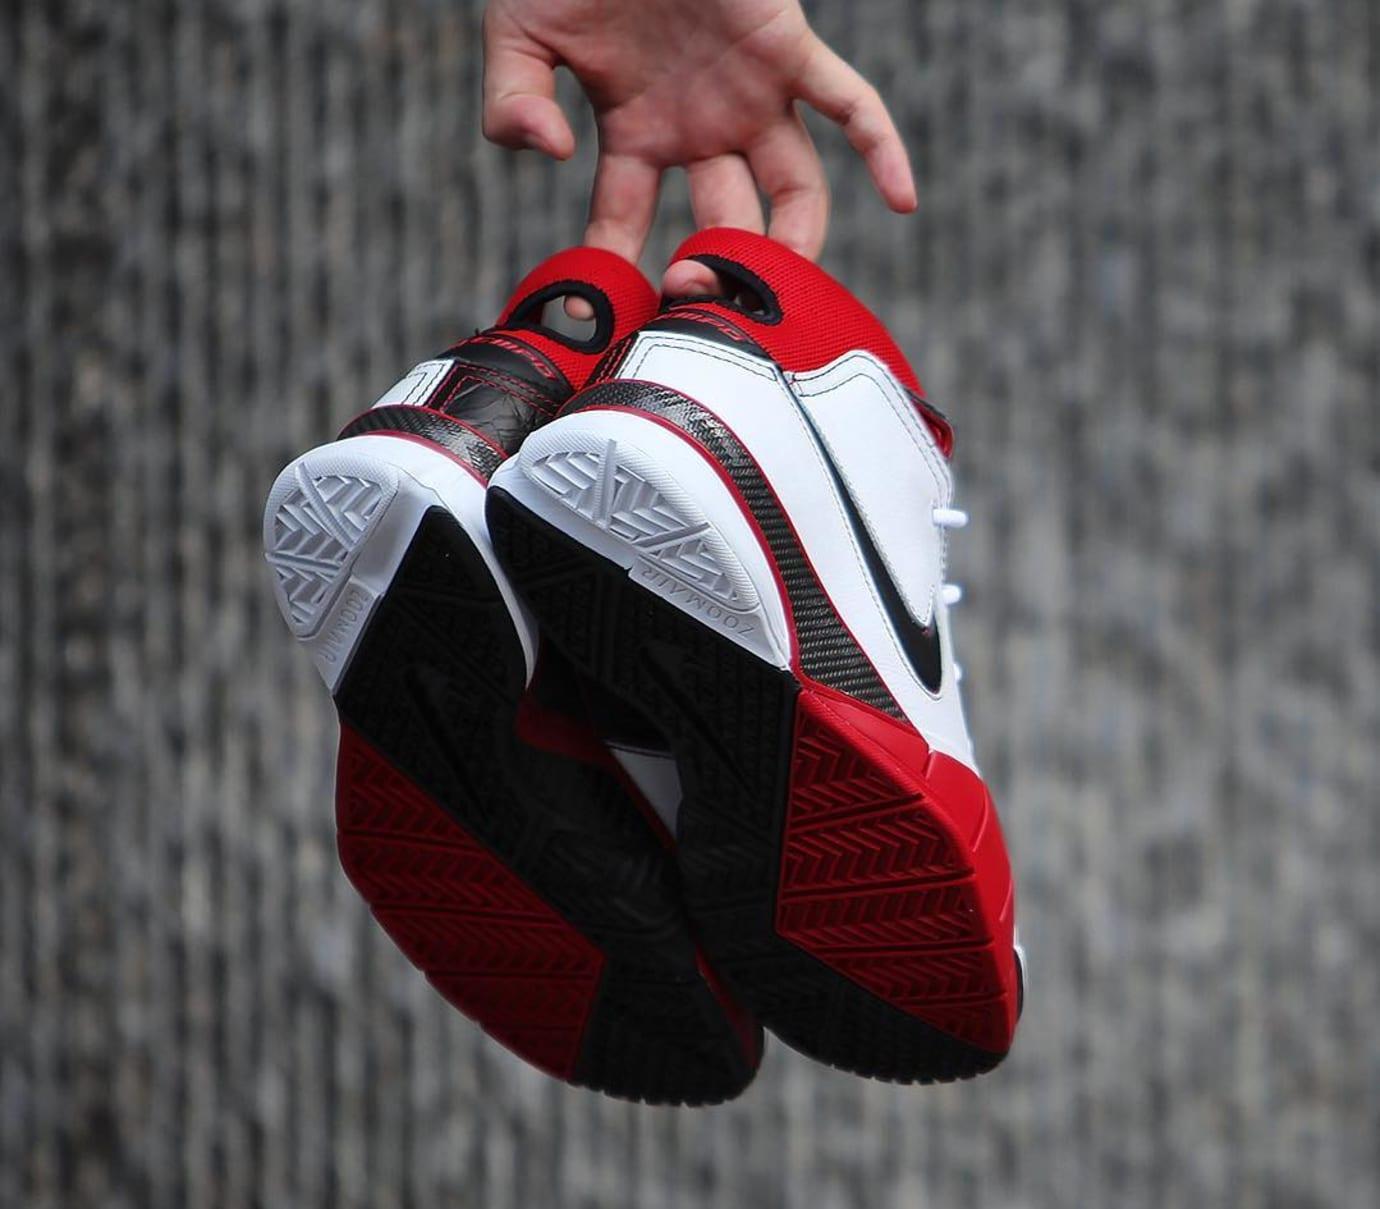 Nike Zoom Kobe 1 Protro All-Star Release Date AQ2728-102 Sole